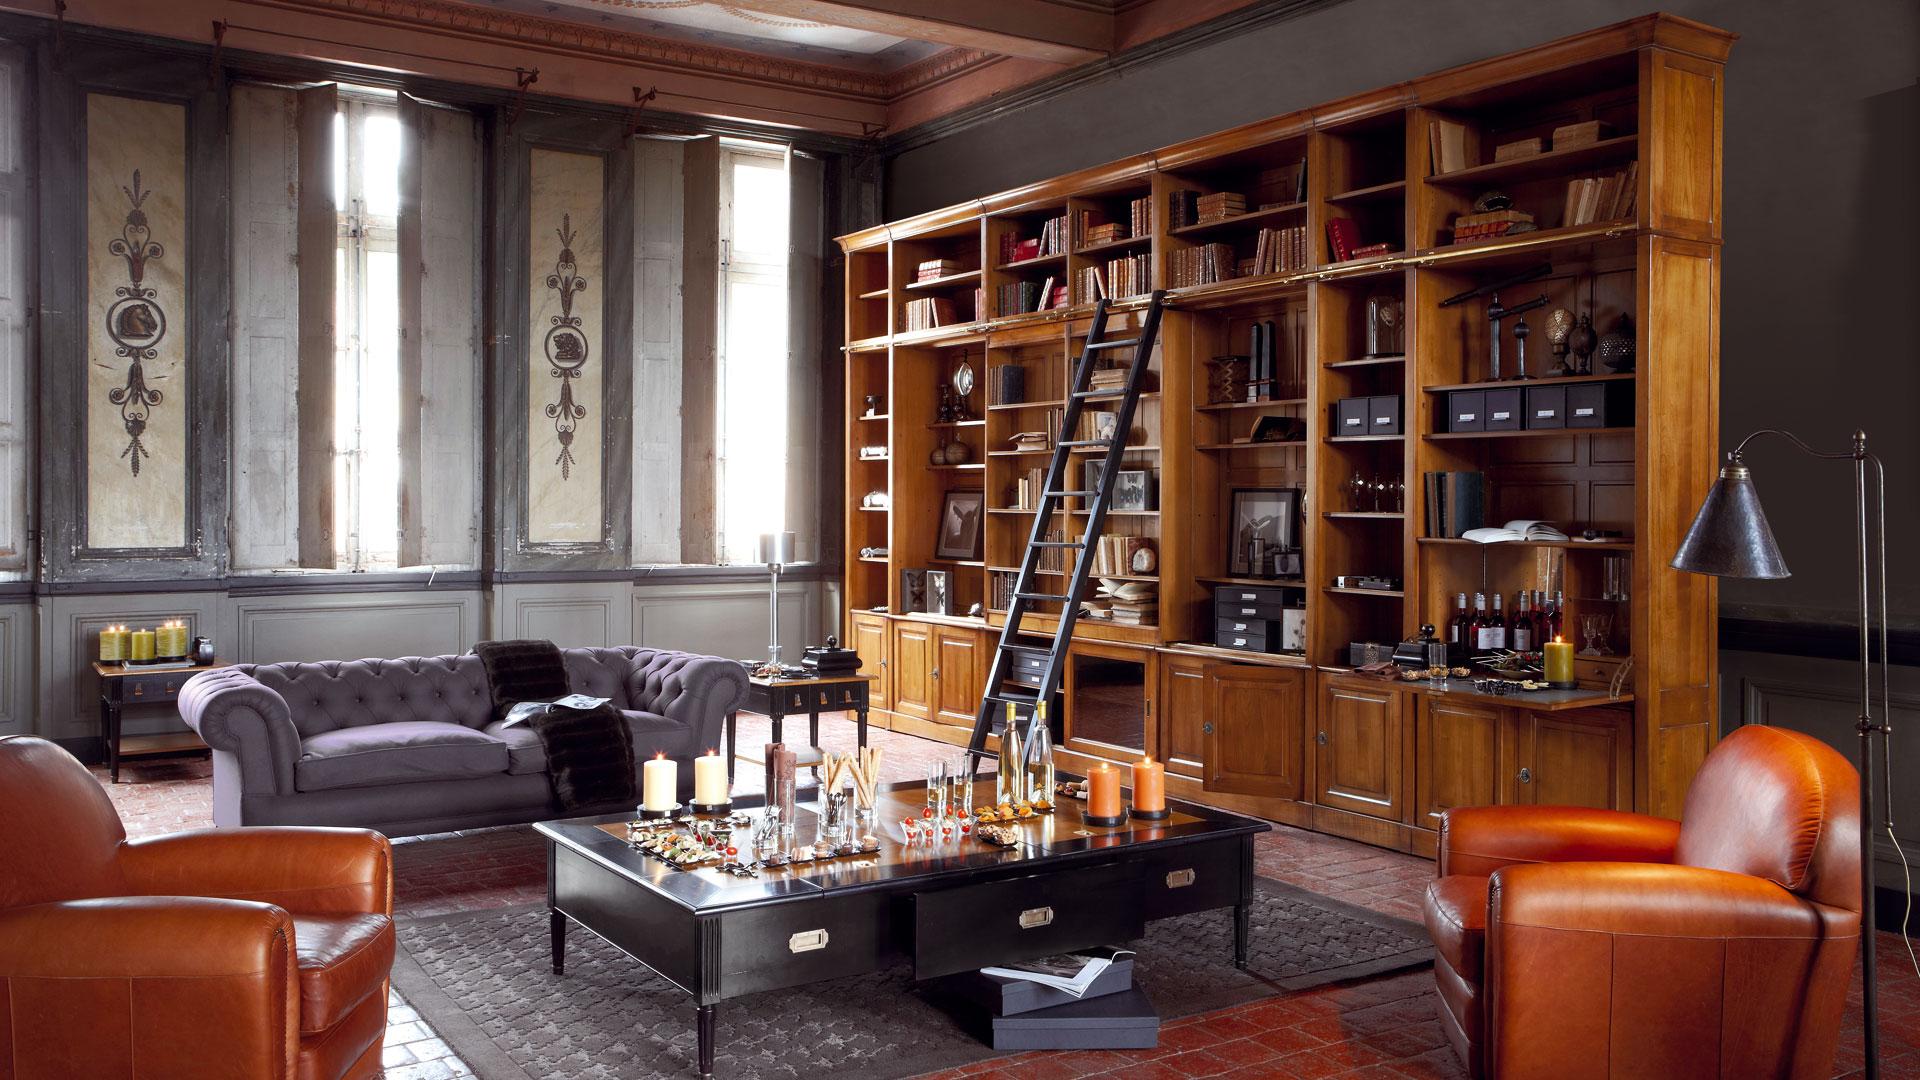 GRANGE DIRECTOIRE nappali bútor kollekció